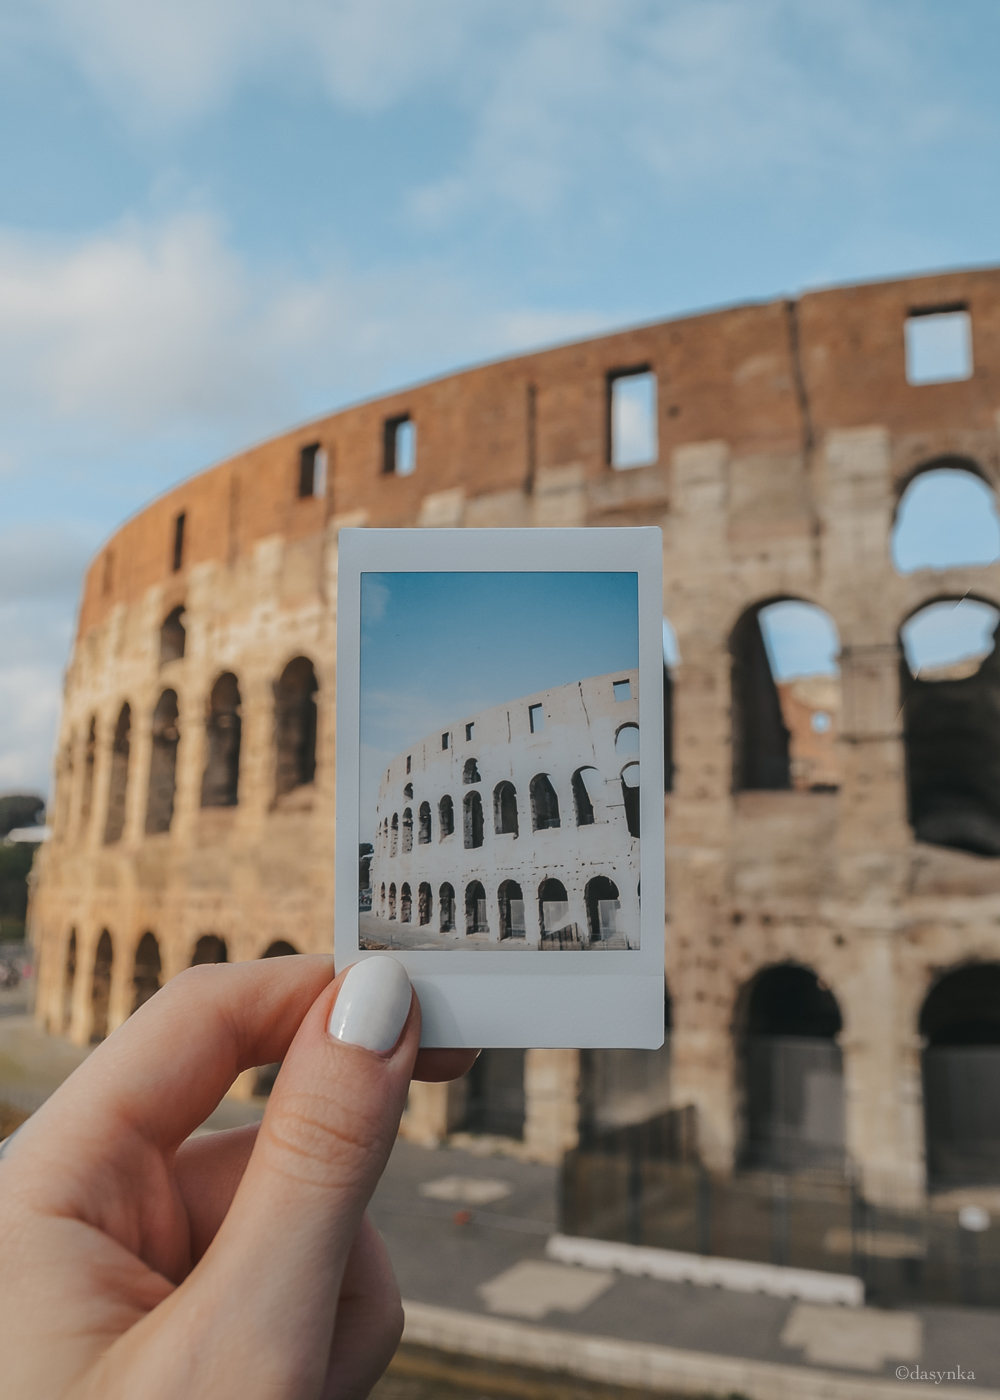 dasynka-fashion-blog-blogger-influencer-inspiration-shooting-globettrotter-travel-traveller-instagram-lifestyle-italy-ideas-italian-polaroids-polaroid-fujifilm-instax-90-8-worldmap-planisfero-mappa-mondo-pin-memories-photographs-vintage-print-rome-colosseum-roma-colosseo